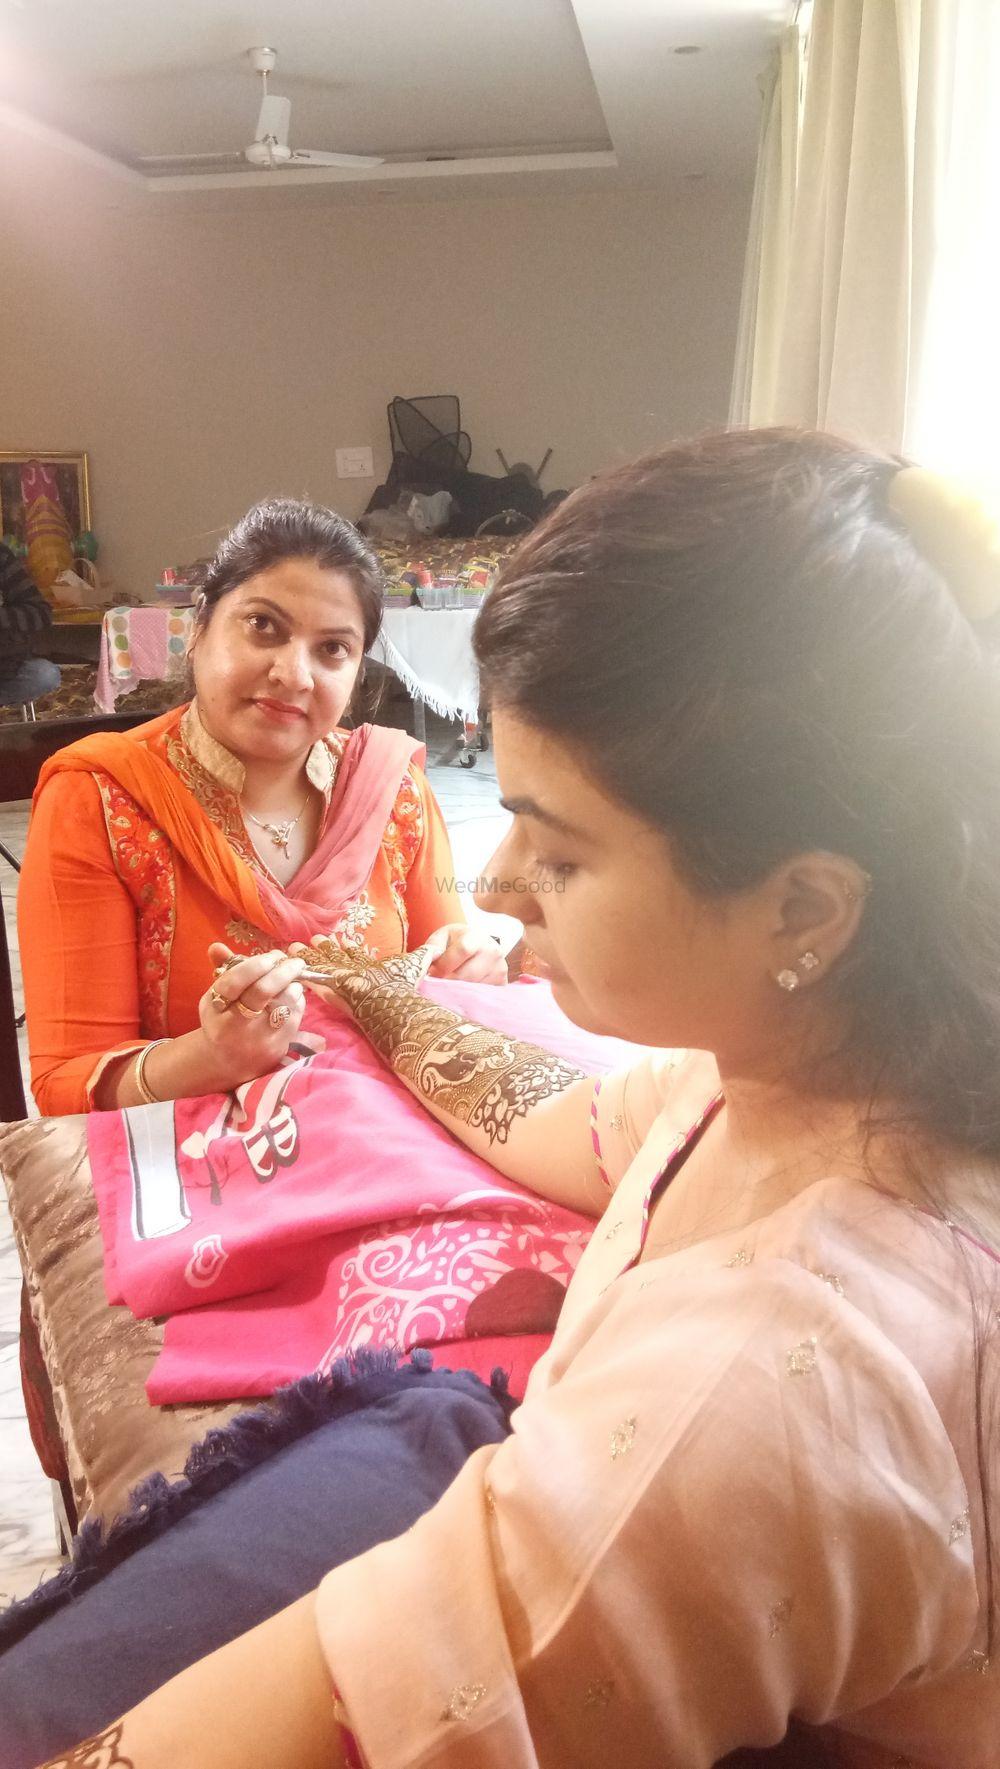 Photo From Geetanshu bhalla bridal mehendi on 17 th nov 2018 at sector 15, faridabad - By Shalini Mehendi Artist